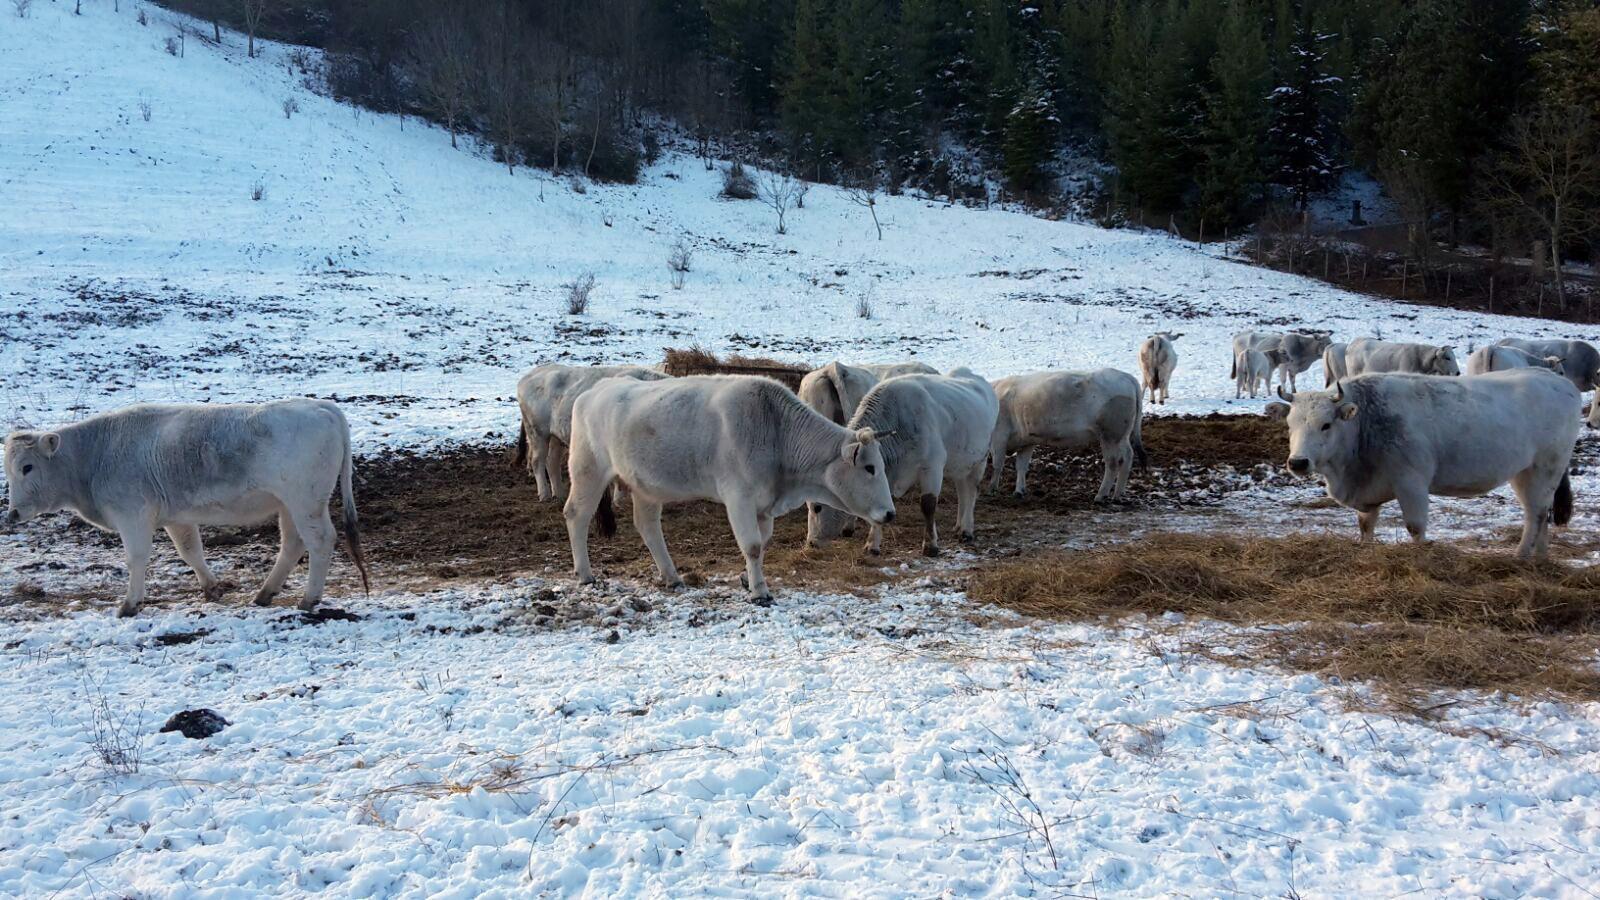 Terremoto: allevatori, mucche assiderate senza stalle